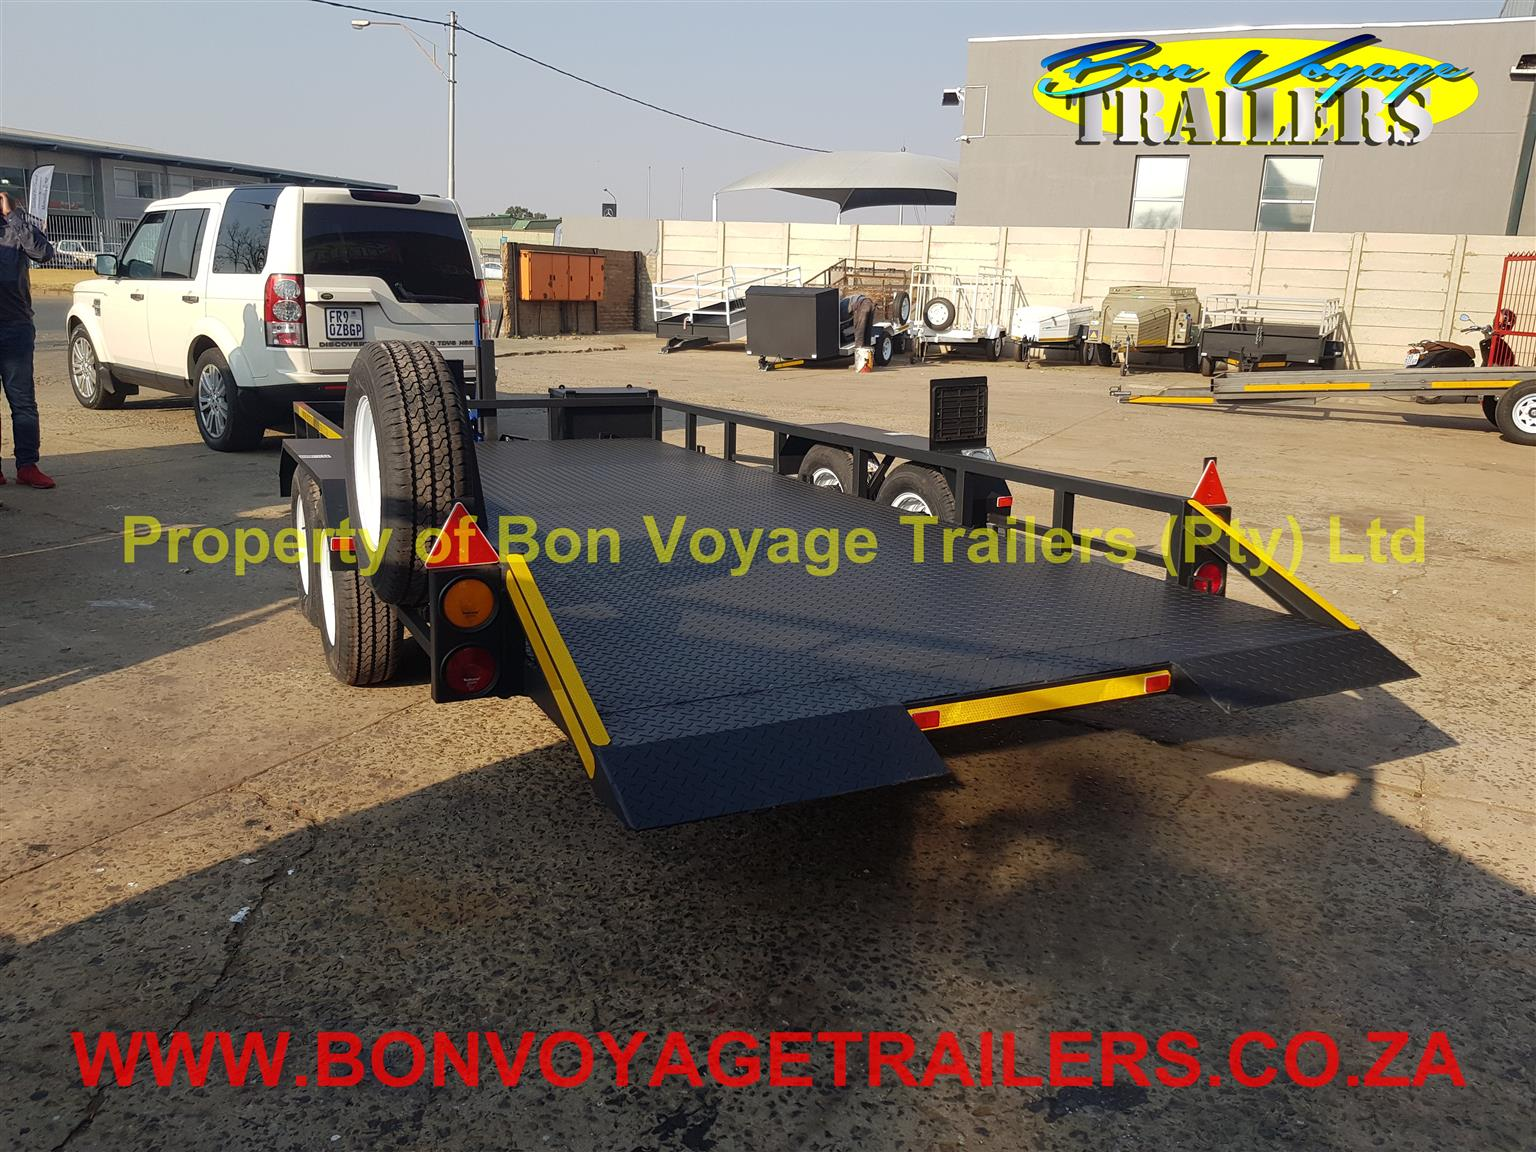 PLATE FLOOR CAR TRAILER FOR SALE